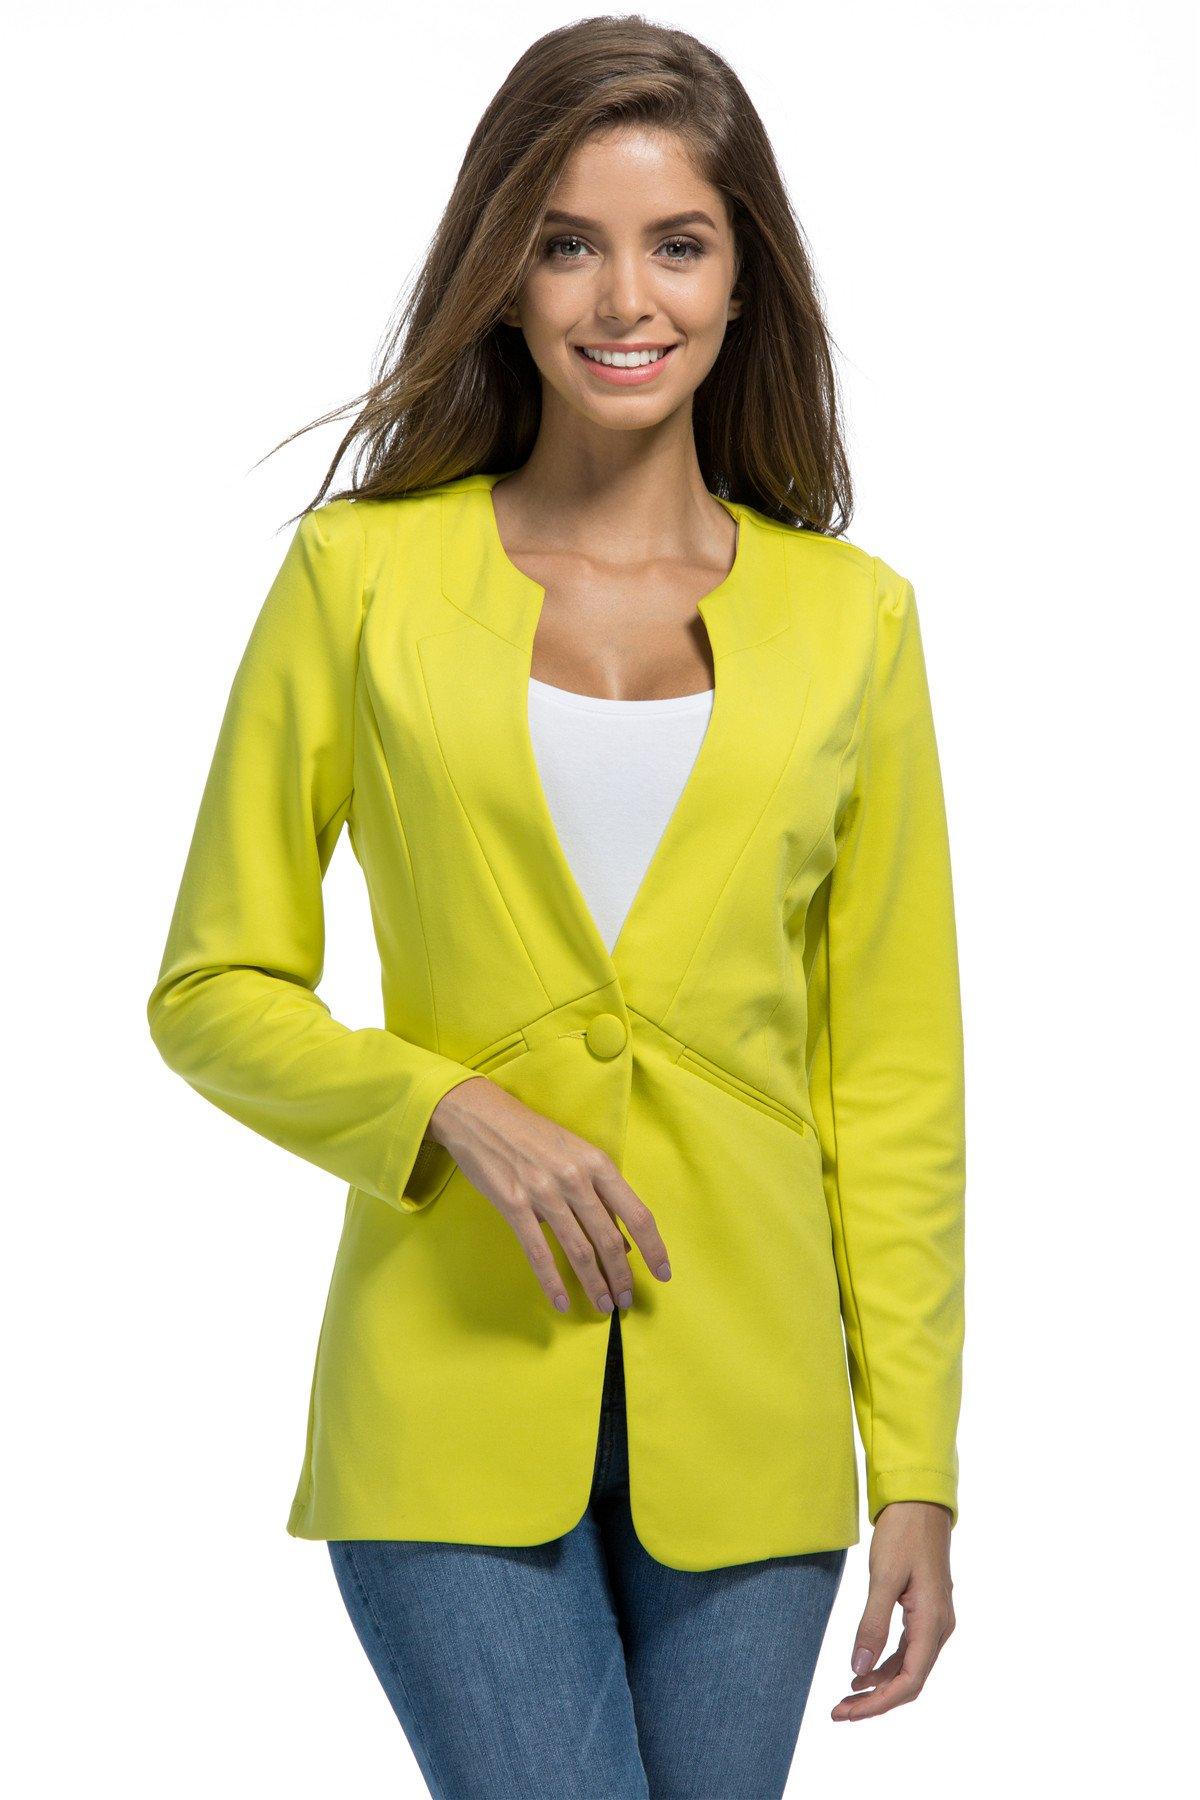 My Wonderful World Women's O-Neck One Button Long Blazer XX-Large Lemon Green (US 8)